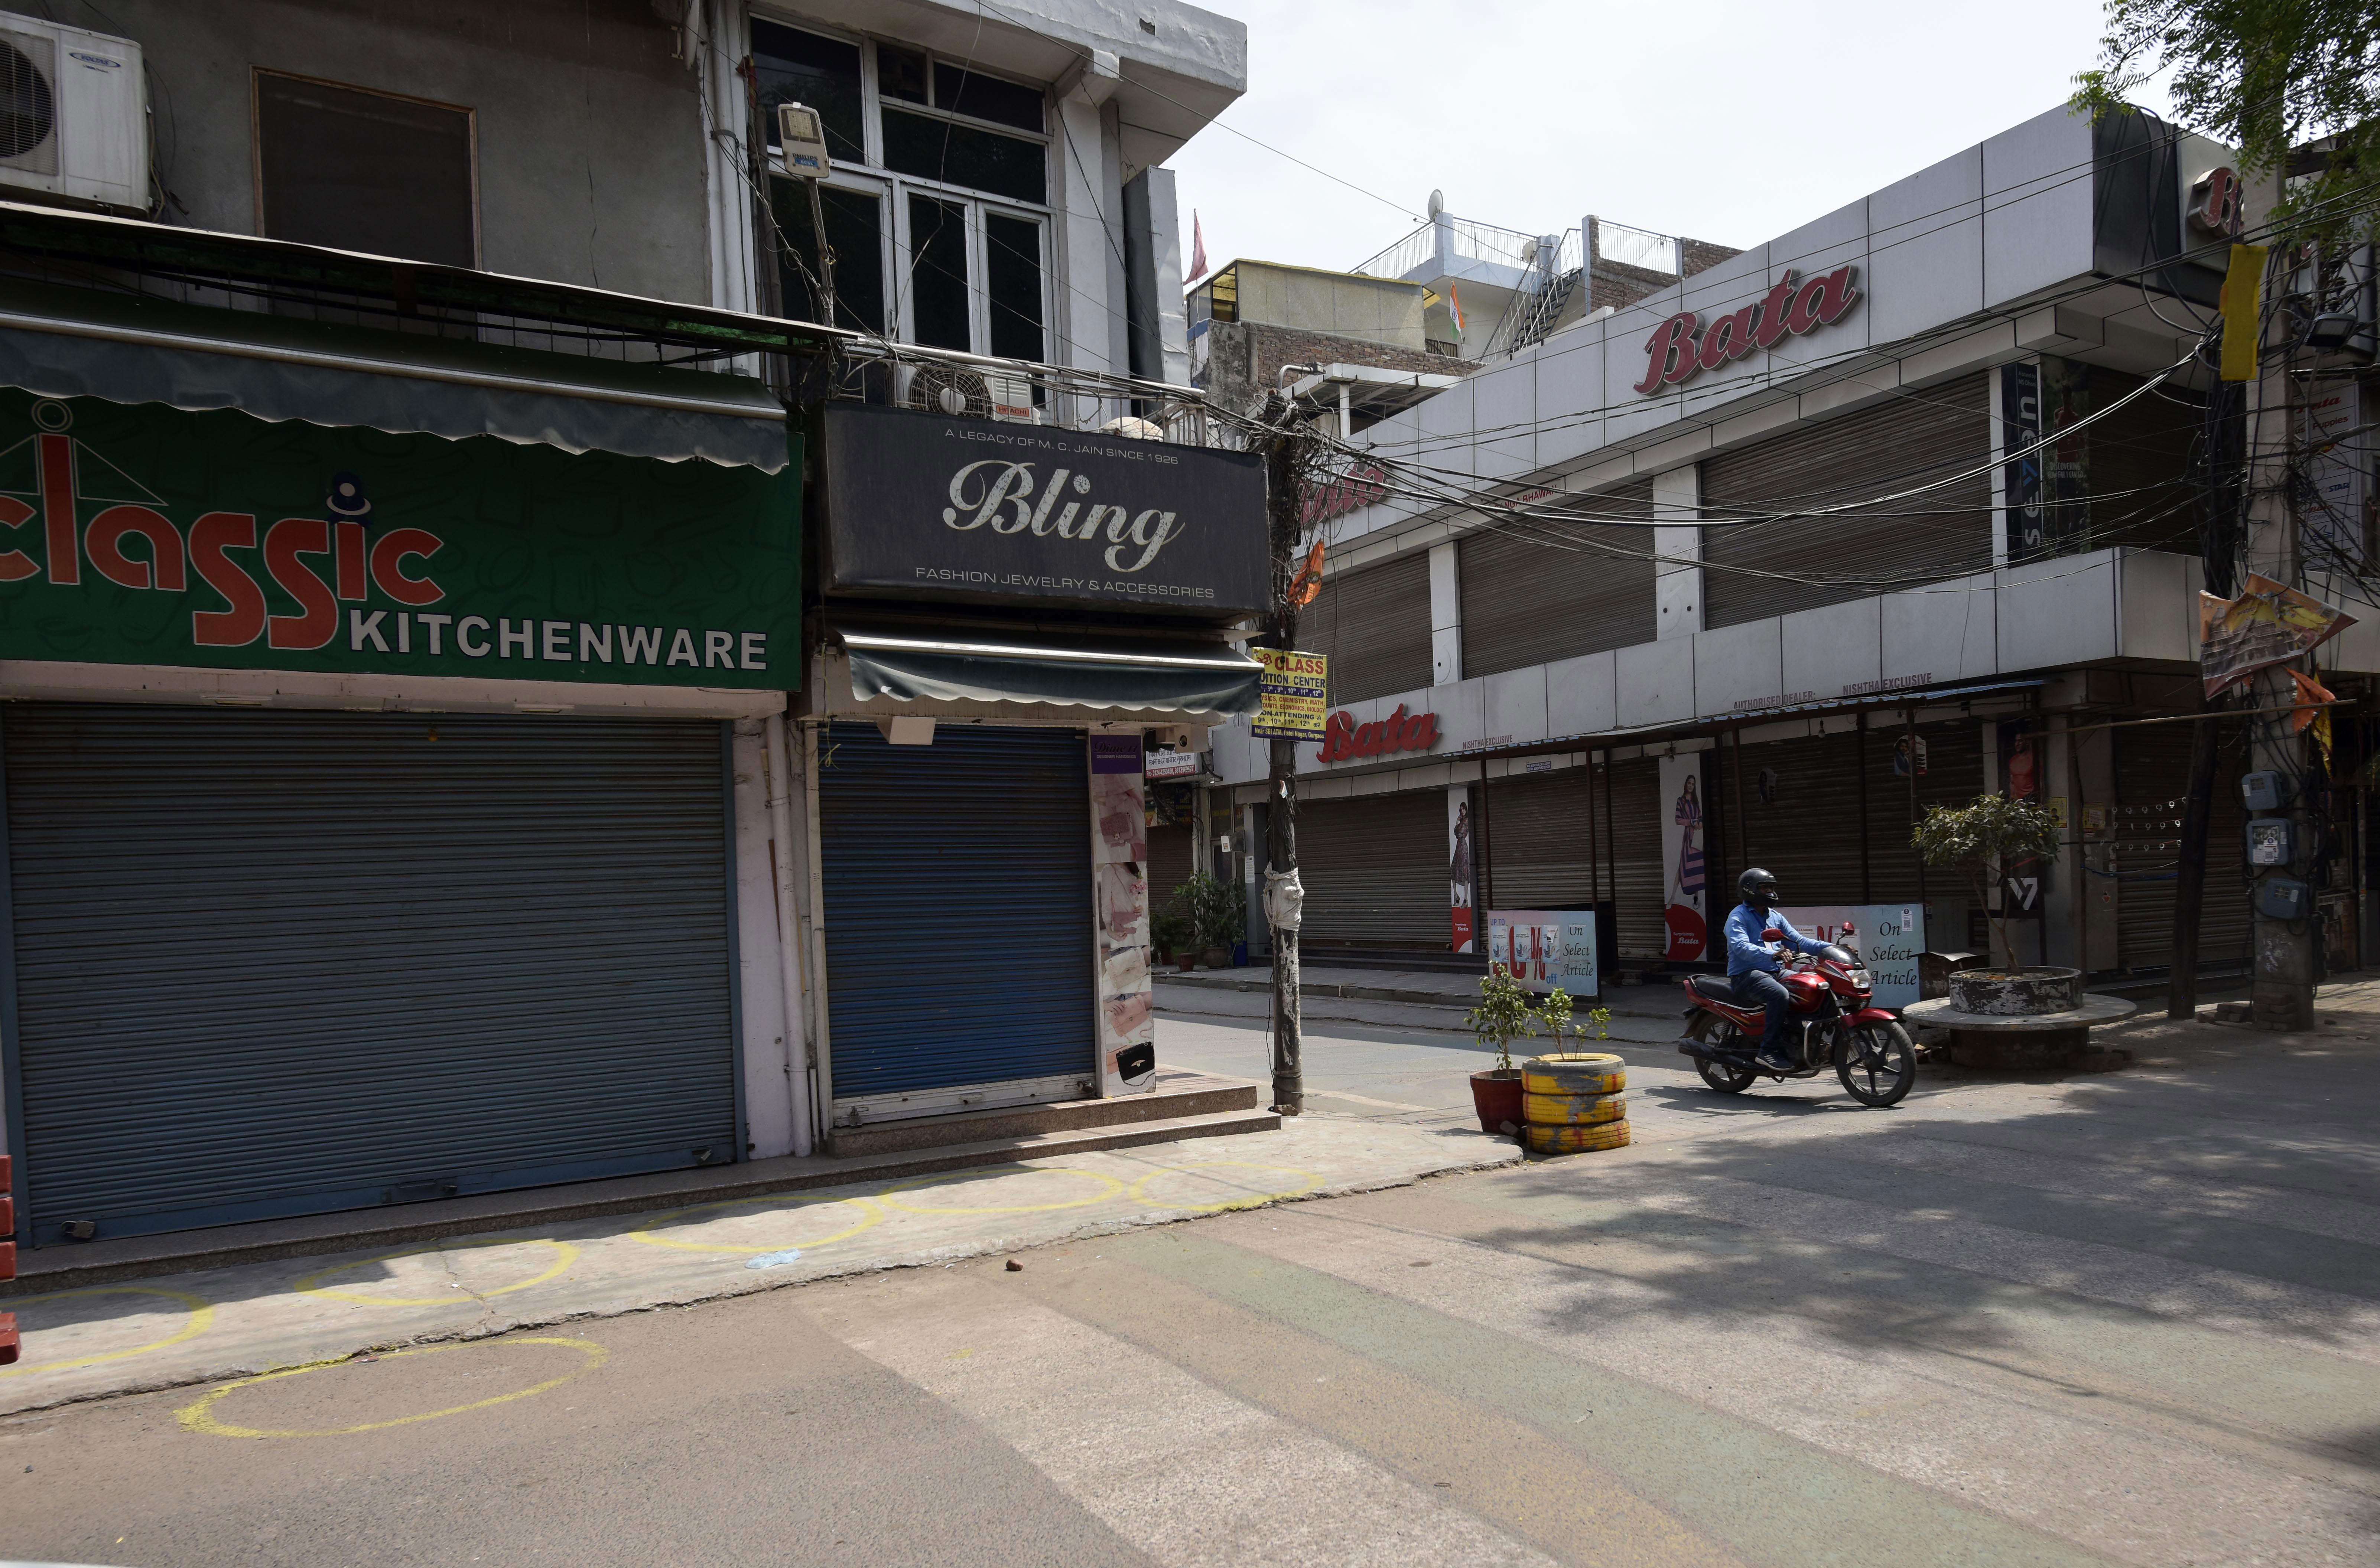 Sadar Bazar is near-empty during a weekend lockdown in Gurugram, India, on May 1.